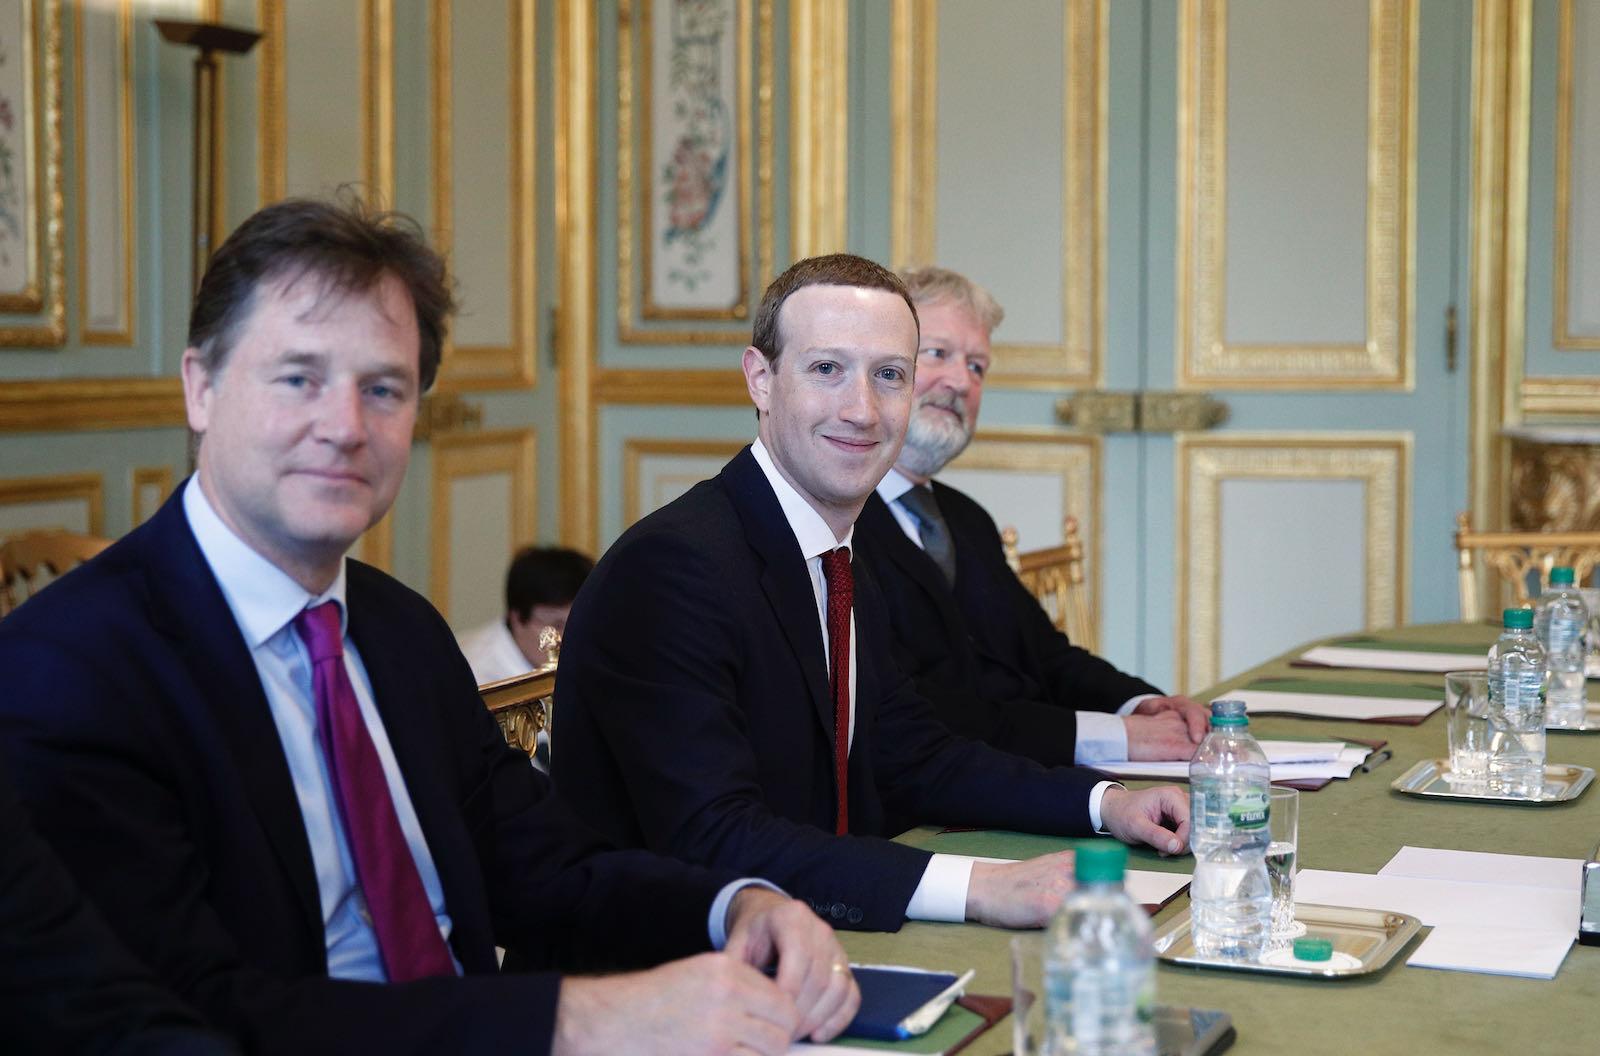 Clegg with Facebook CEO Mark Zuckerberg